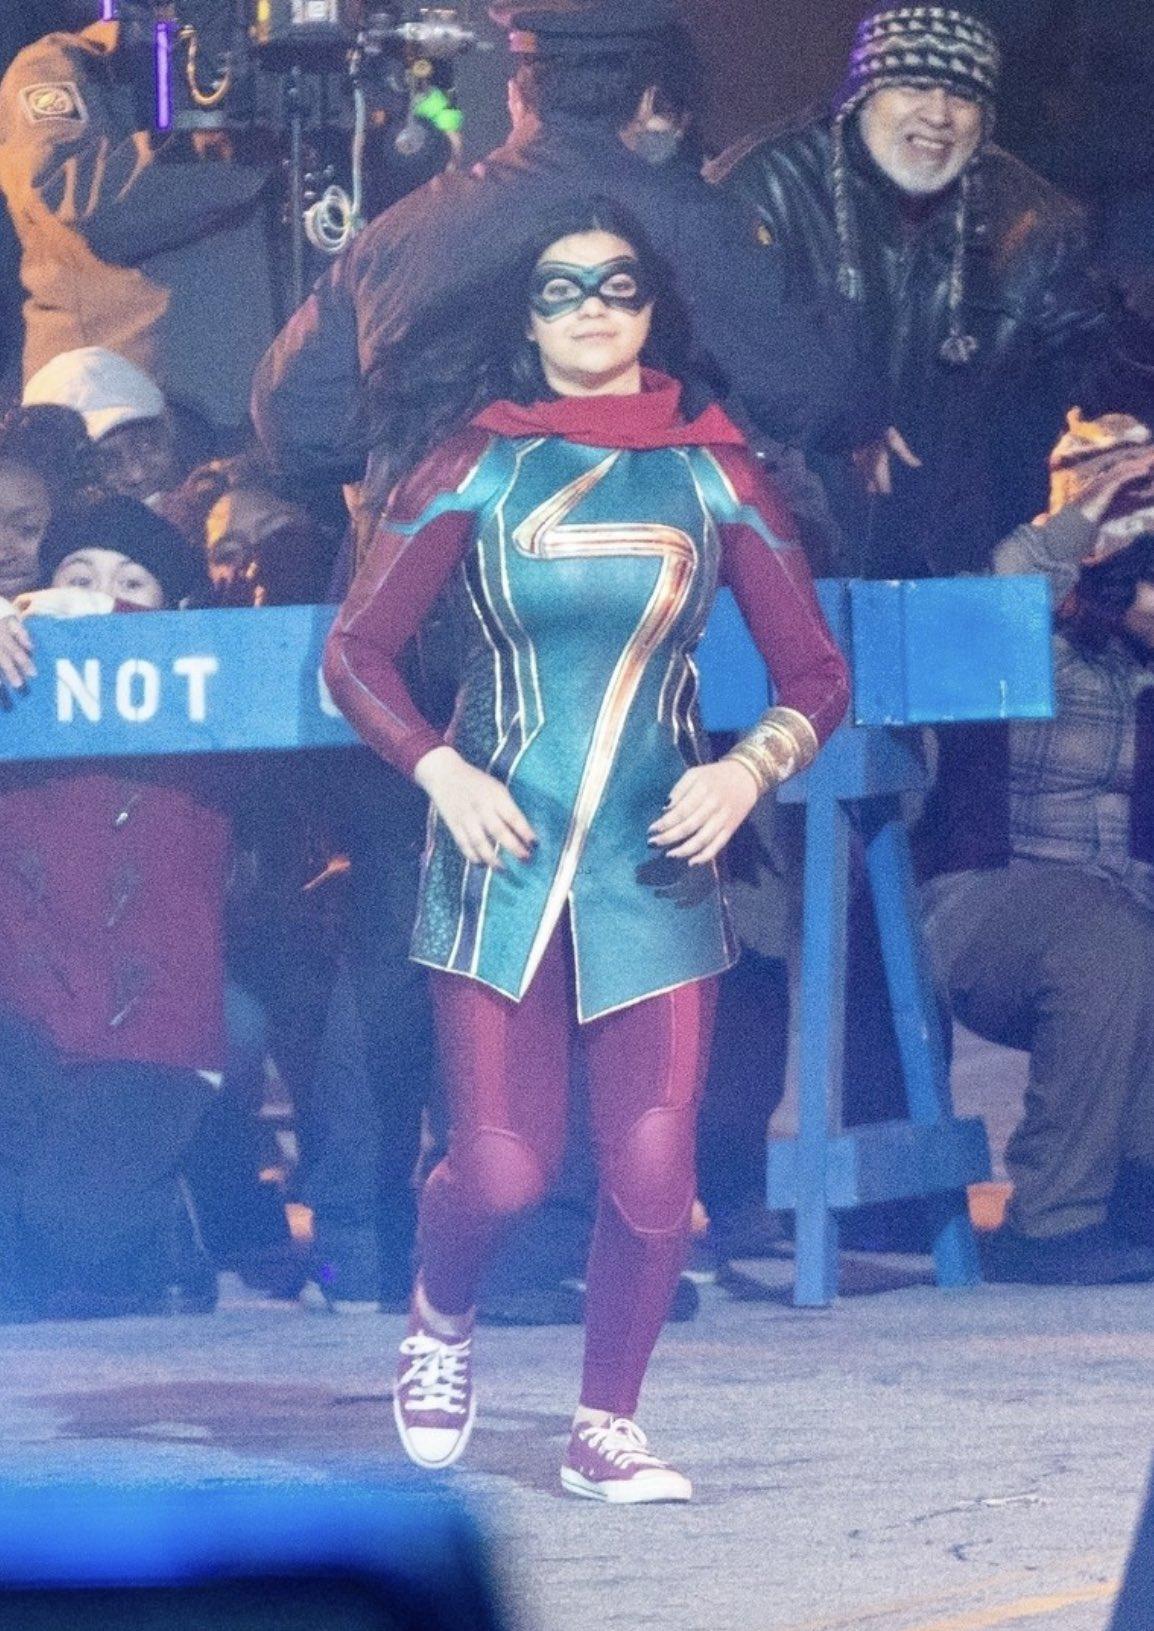 Ms. Marvel's MCU Costume Leaks Online - FandomWire